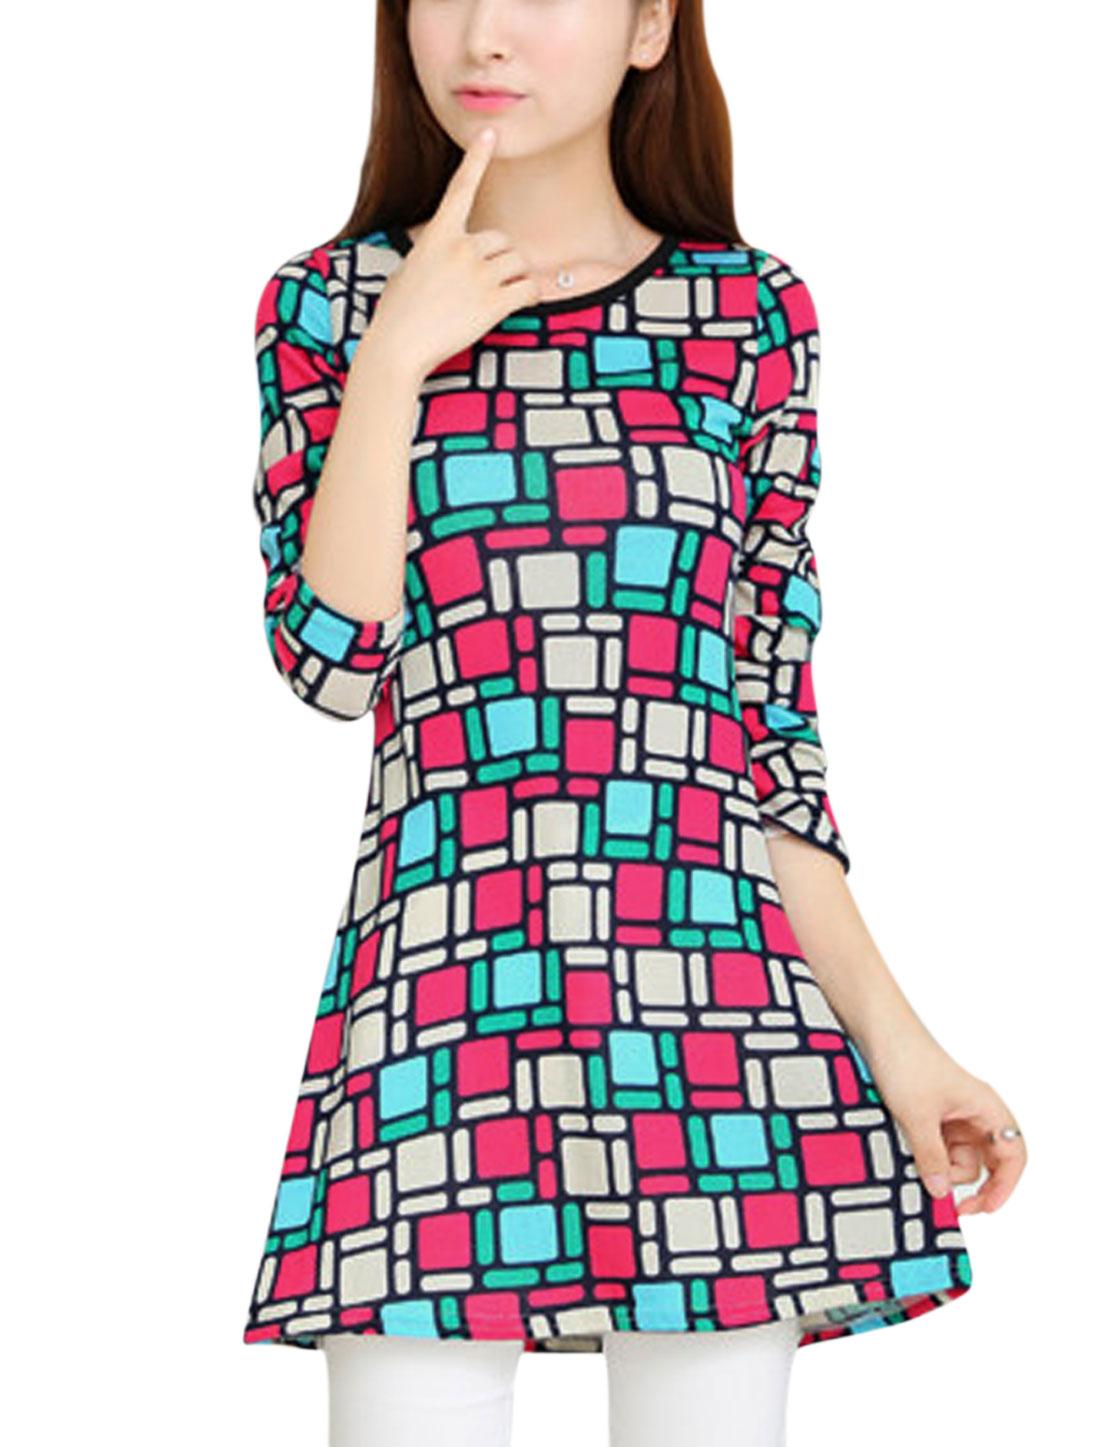 Lady Geometric Prints Long Sleeve Round Neck Tunic Dress Beige Fuchsia XS